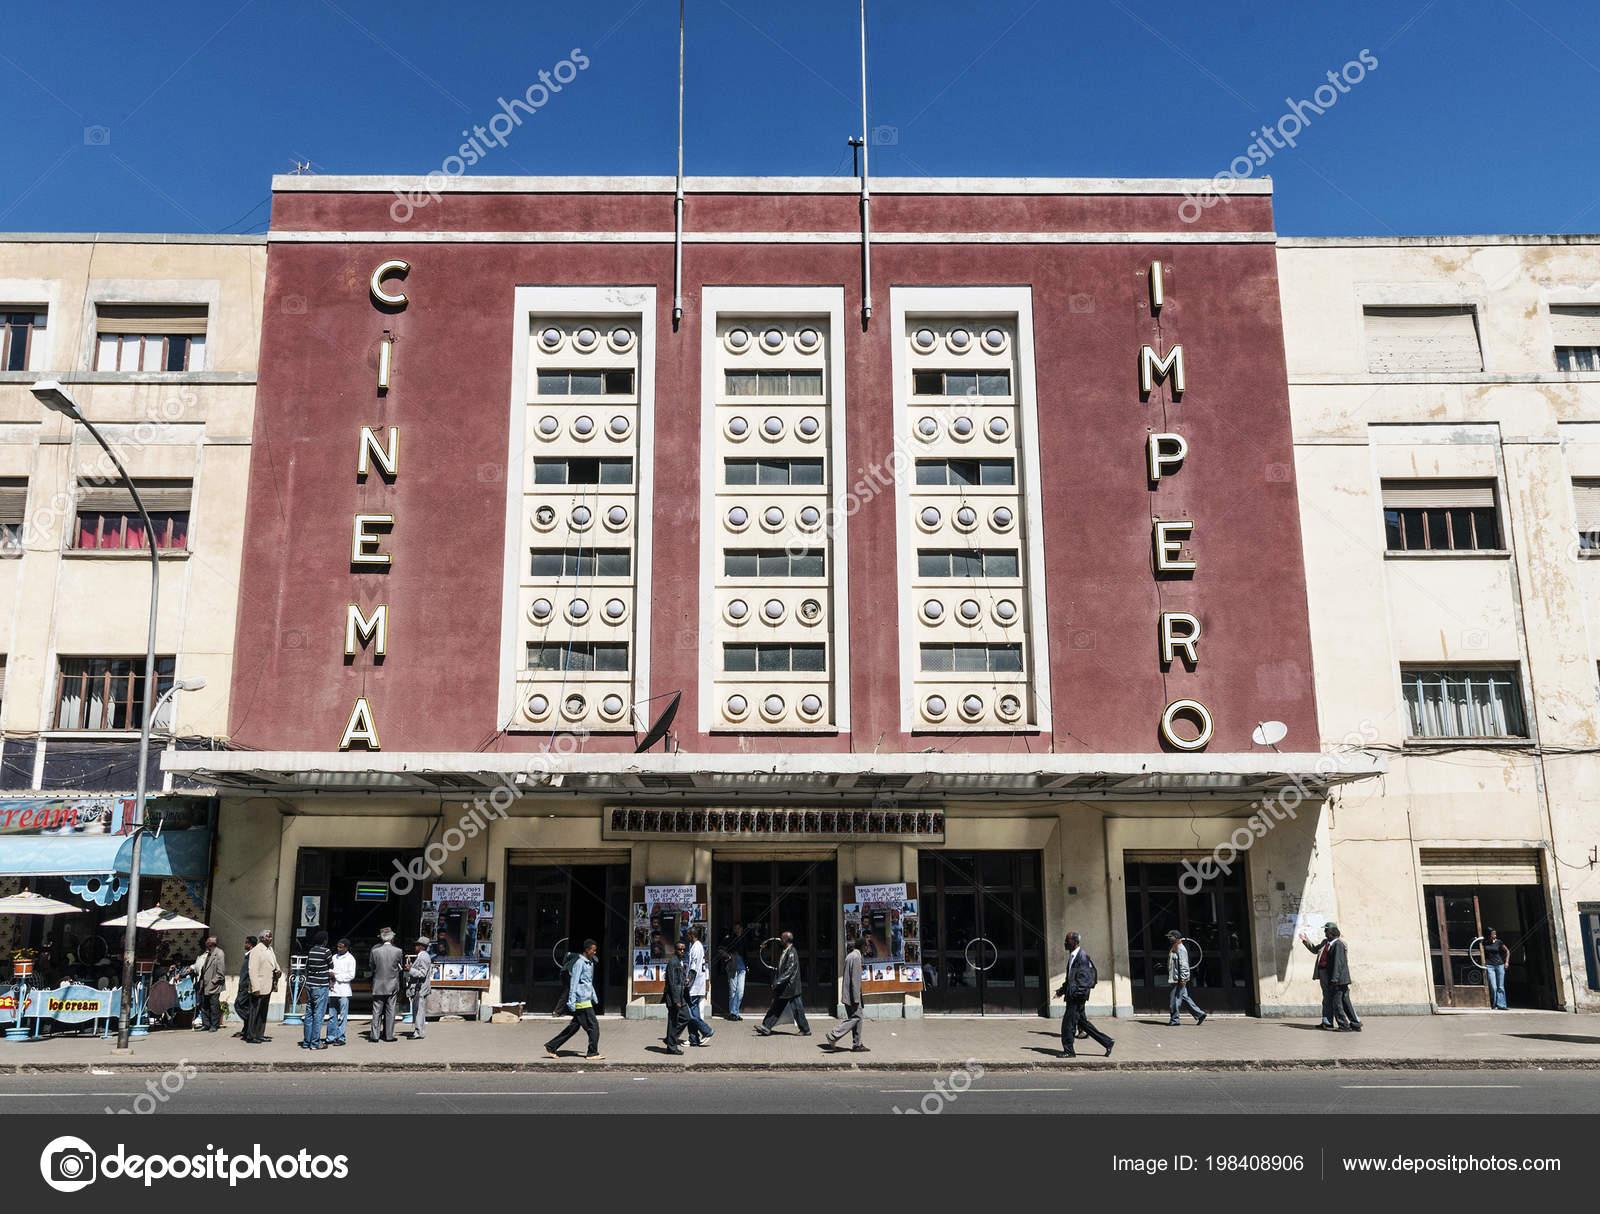 Oude bioscoop italiaanse koloniale art deco gebouw centrale asmara